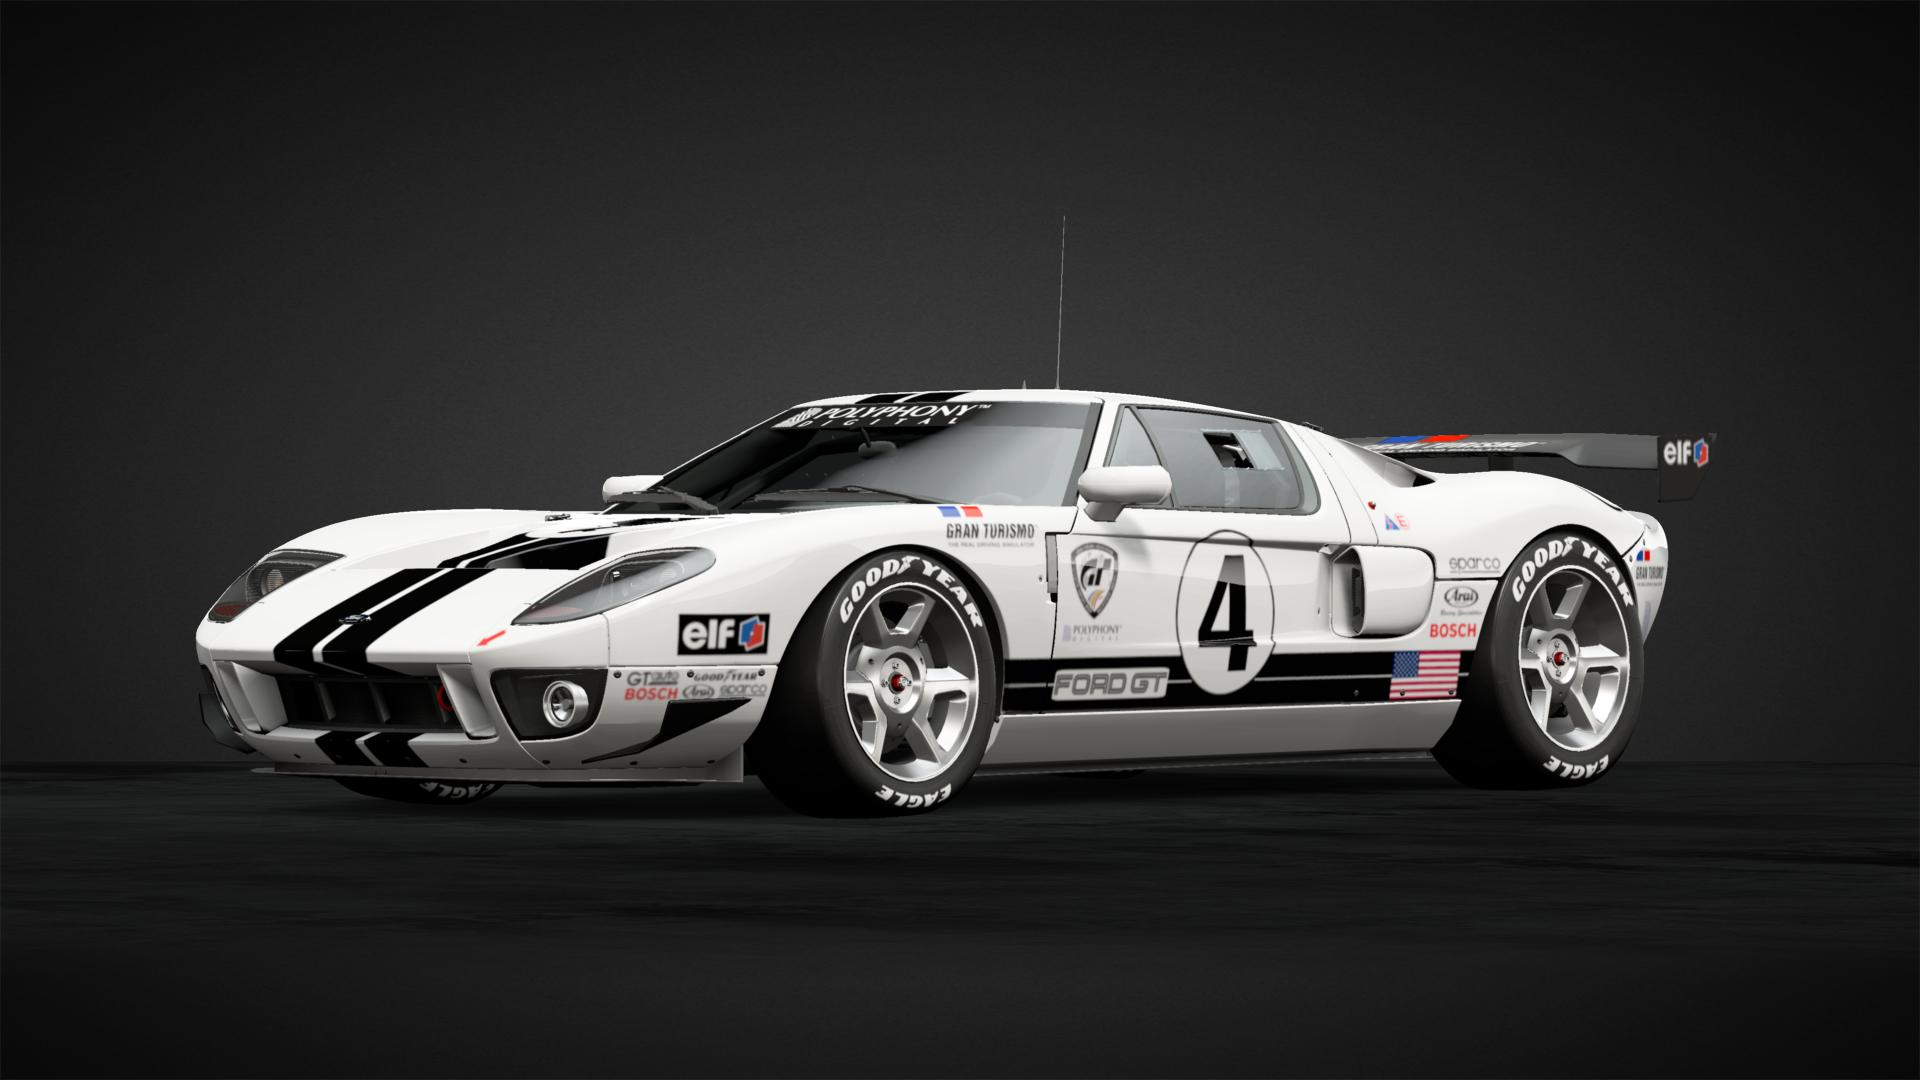 Ford Gt Lm Race Car Spec Ii Car Livery By Bert__ Community Gran Turismo Sport